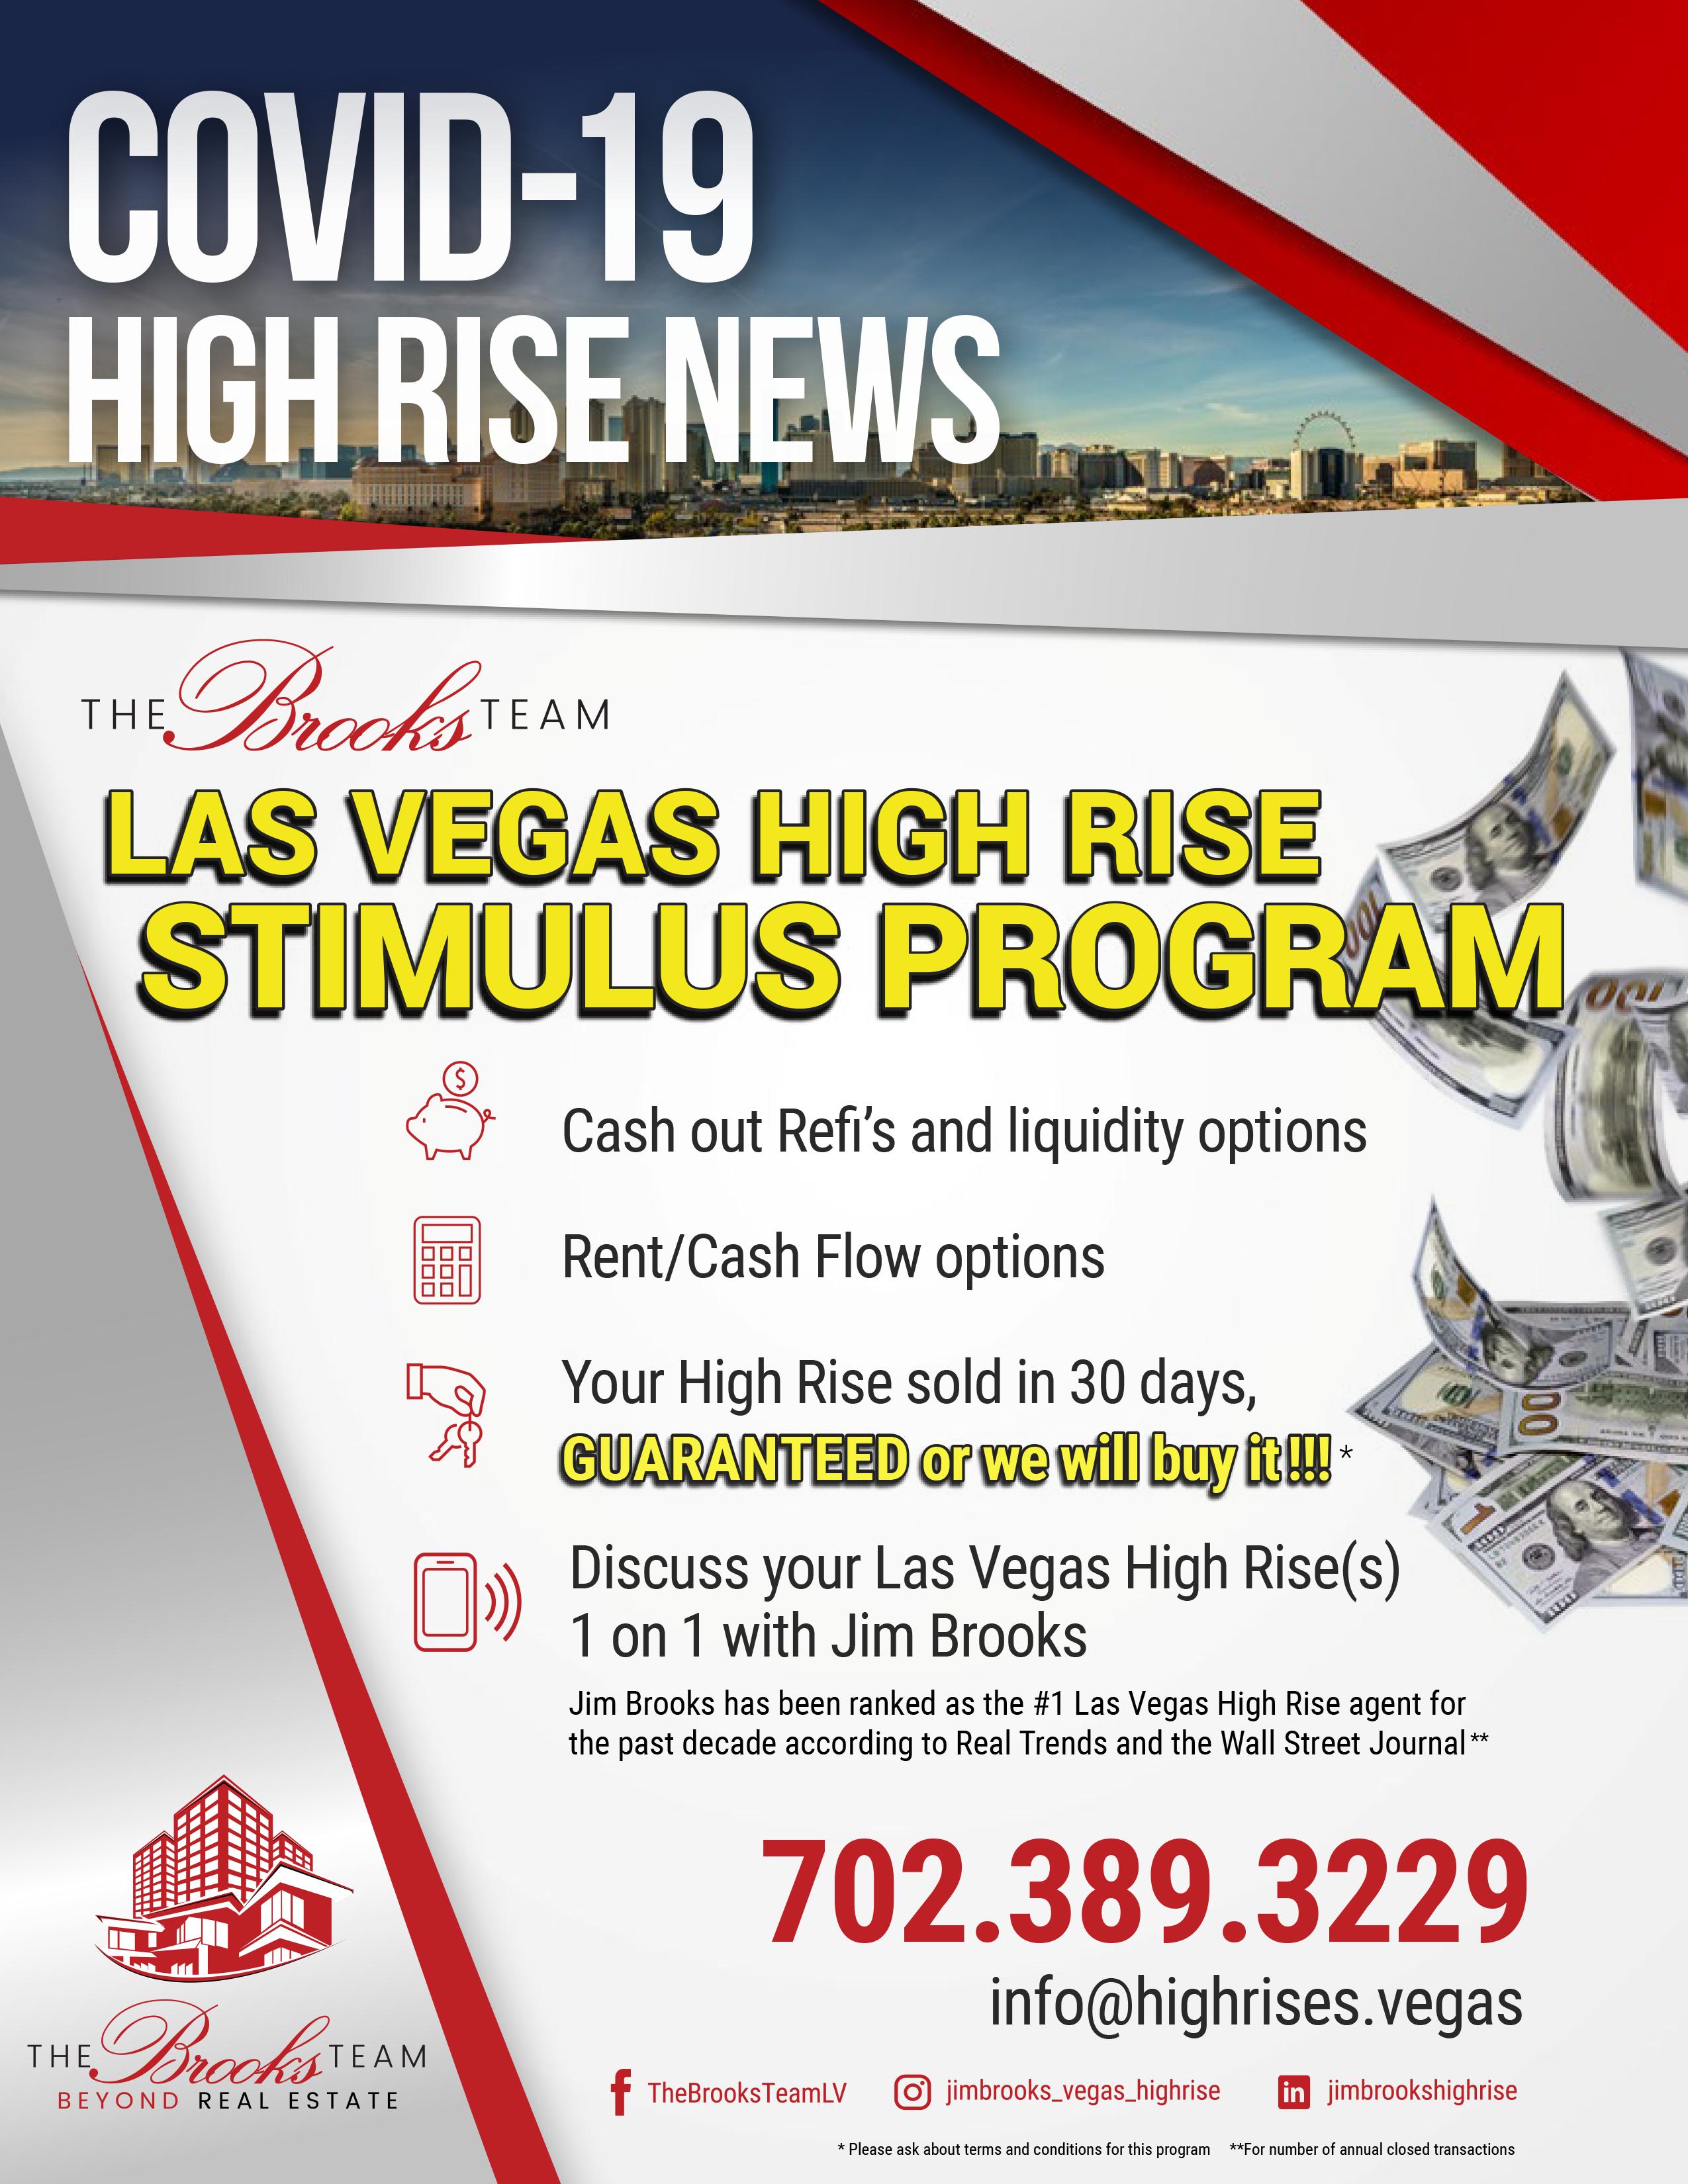 Palms Place Owners Stimulus Program